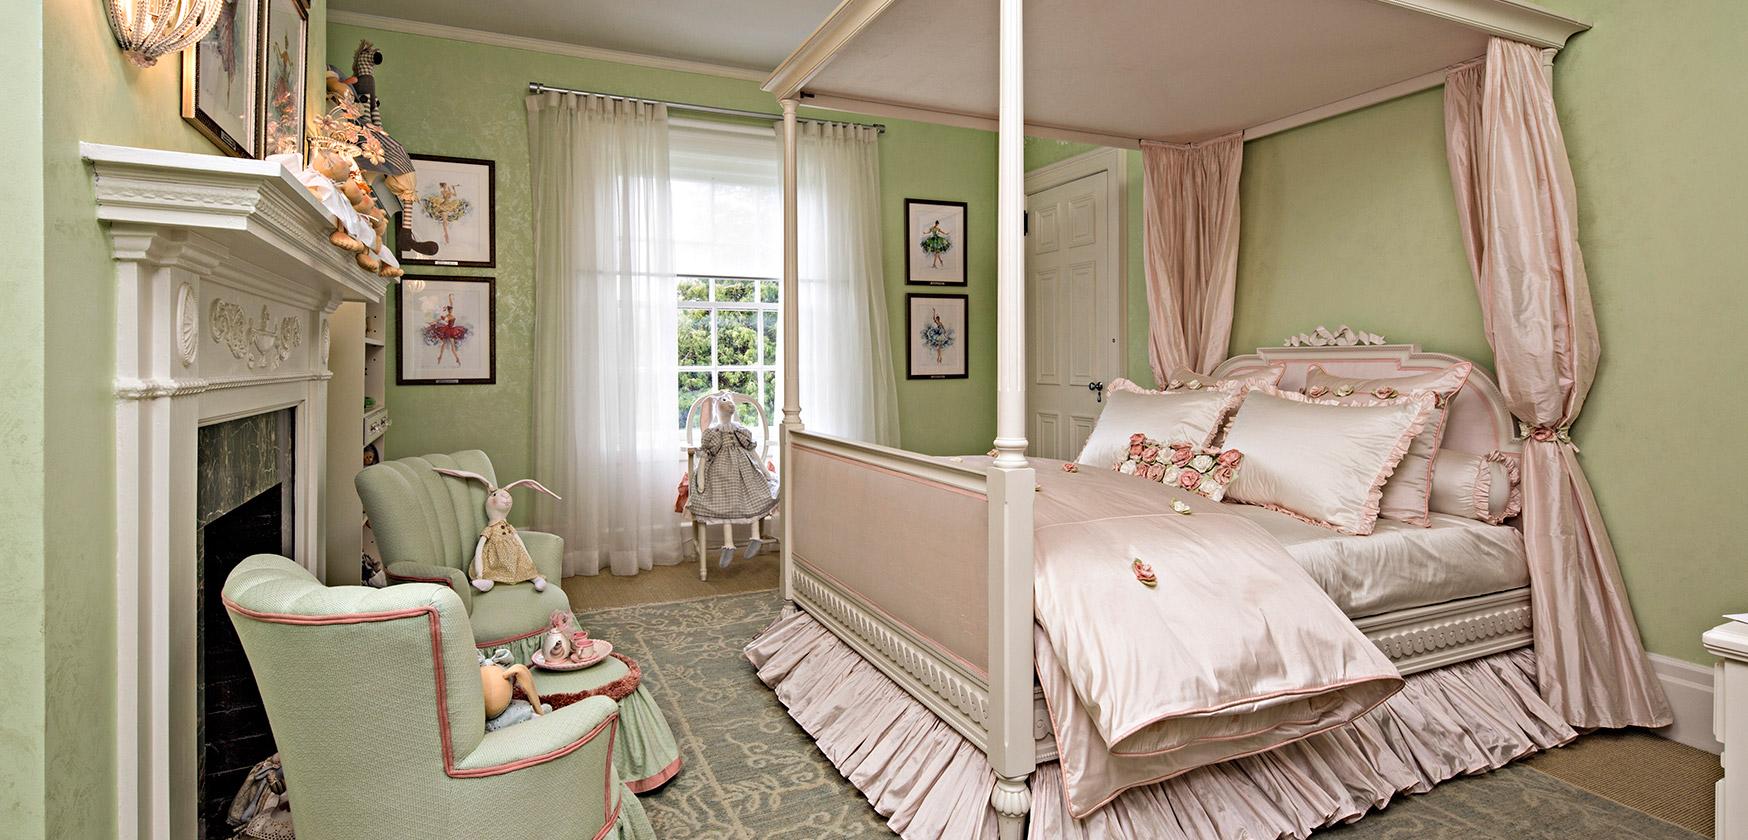 Teen Bedroom Interior Design Sleeping Beauty Zoyab Ny